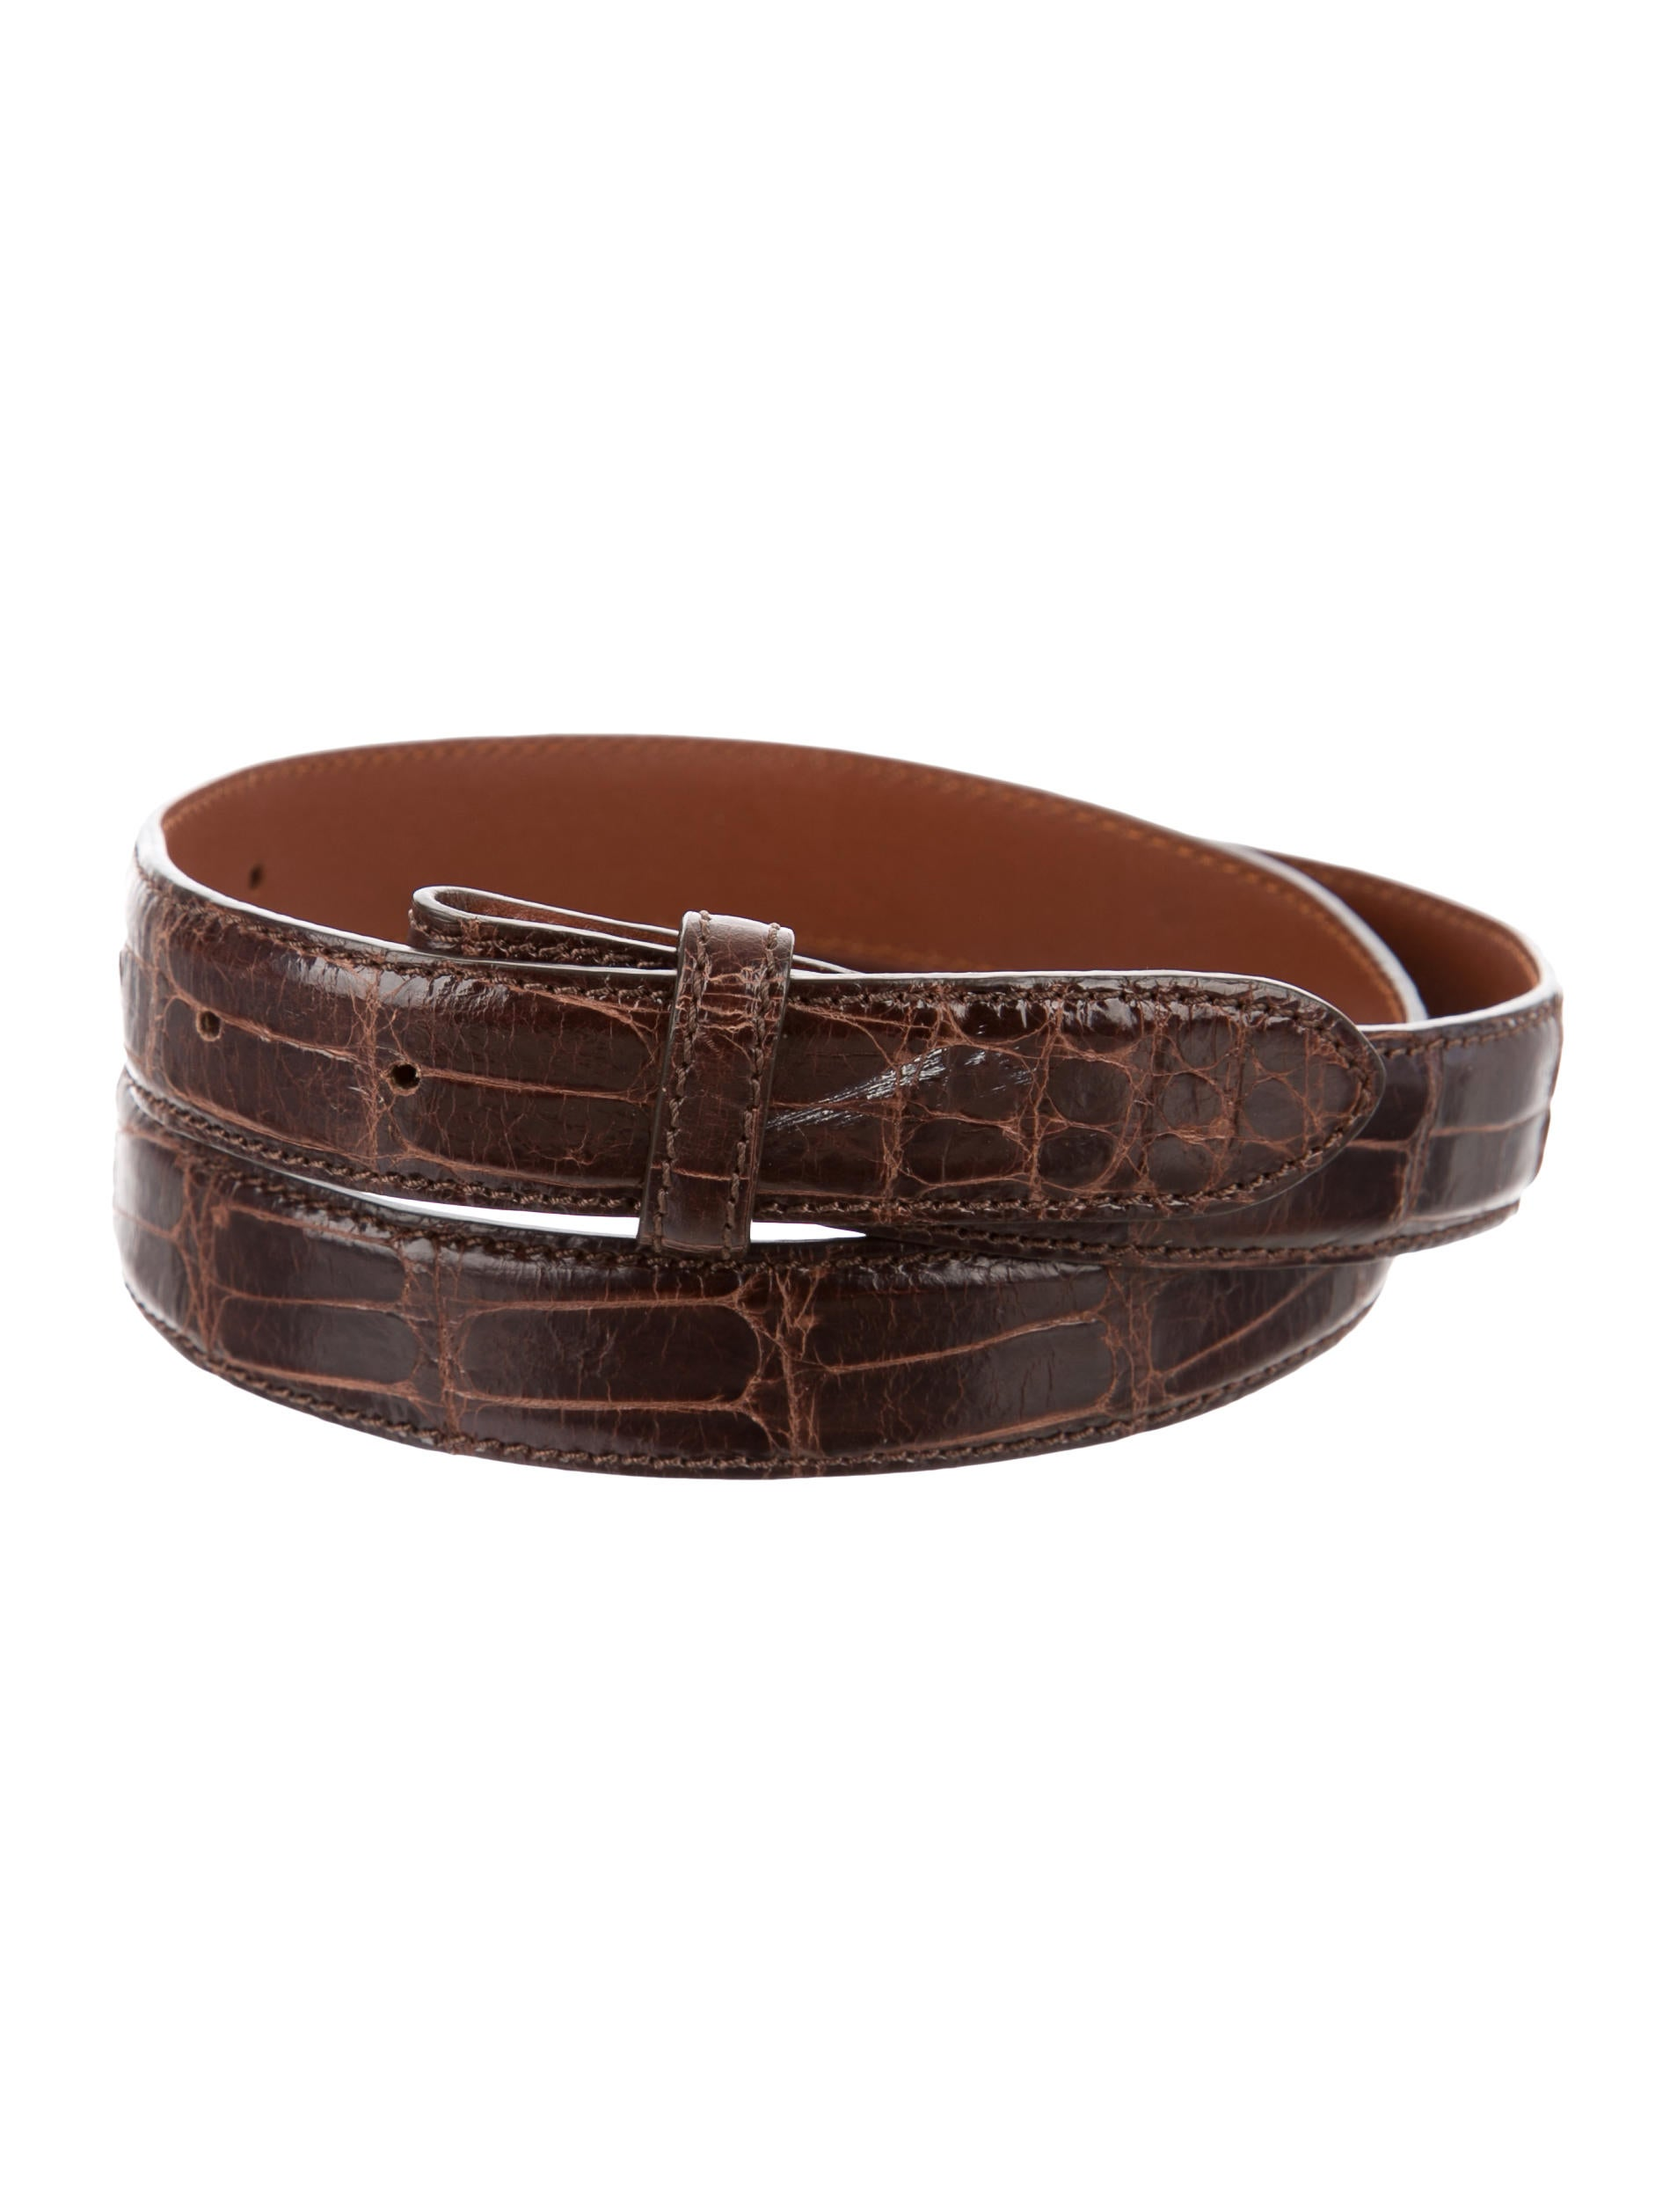 ralph lauren alligator belt strap accessories wyg21095. Black Bedroom Furniture Sets. Home Design Ideas